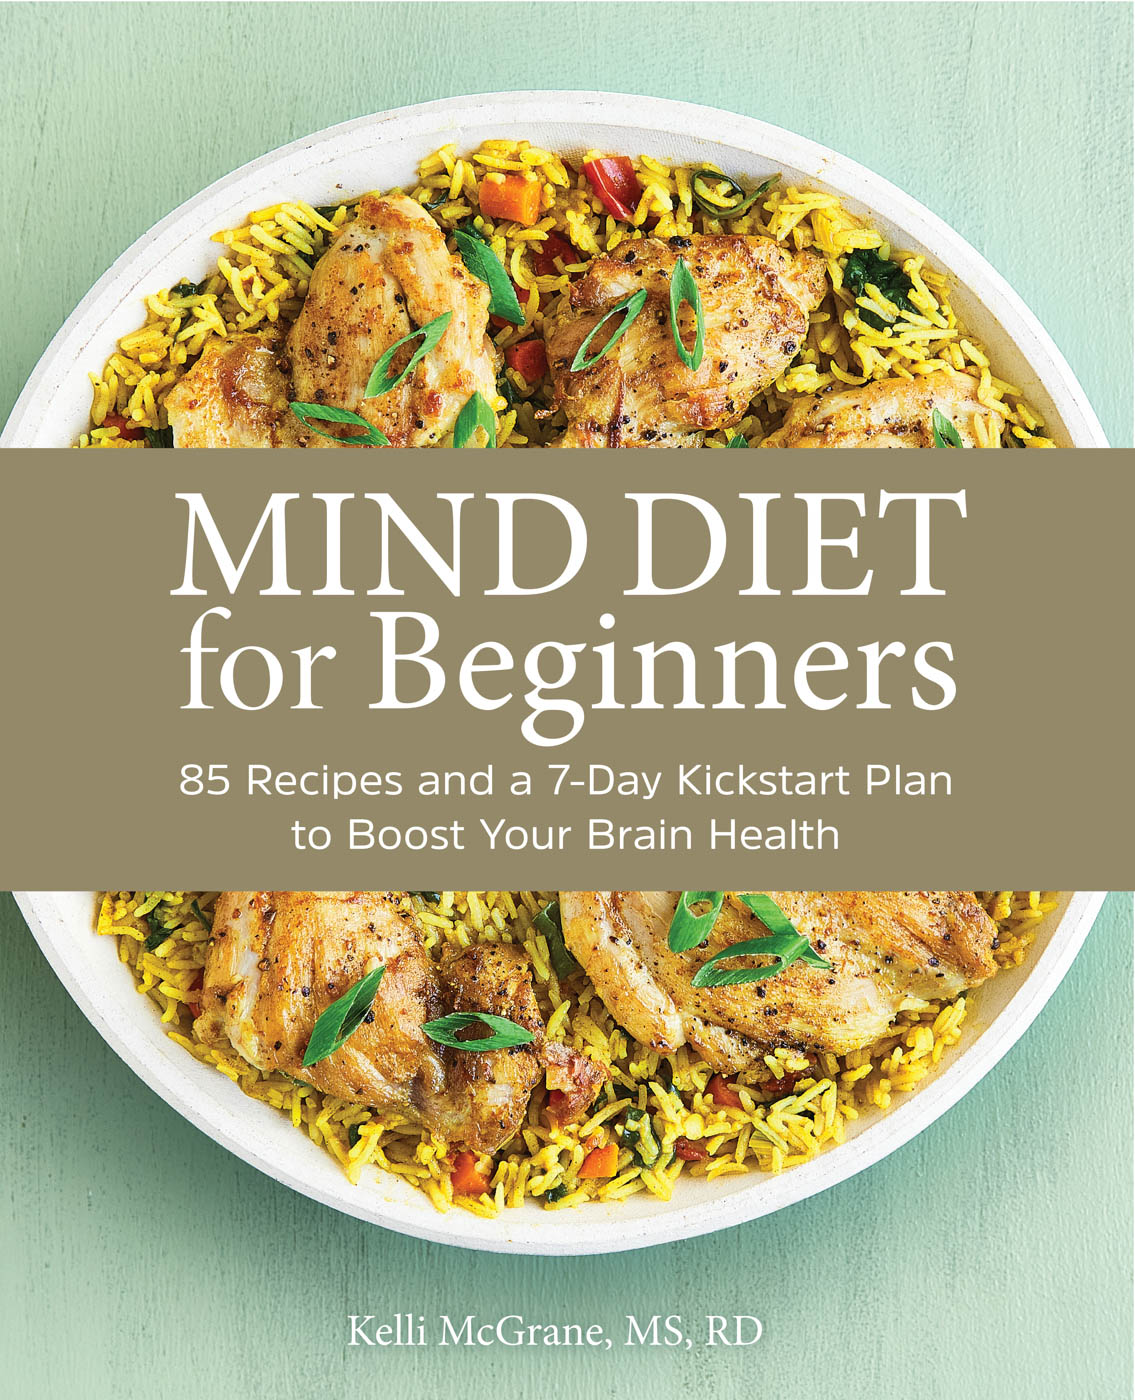 MIND Diet Cookbook for Beginners